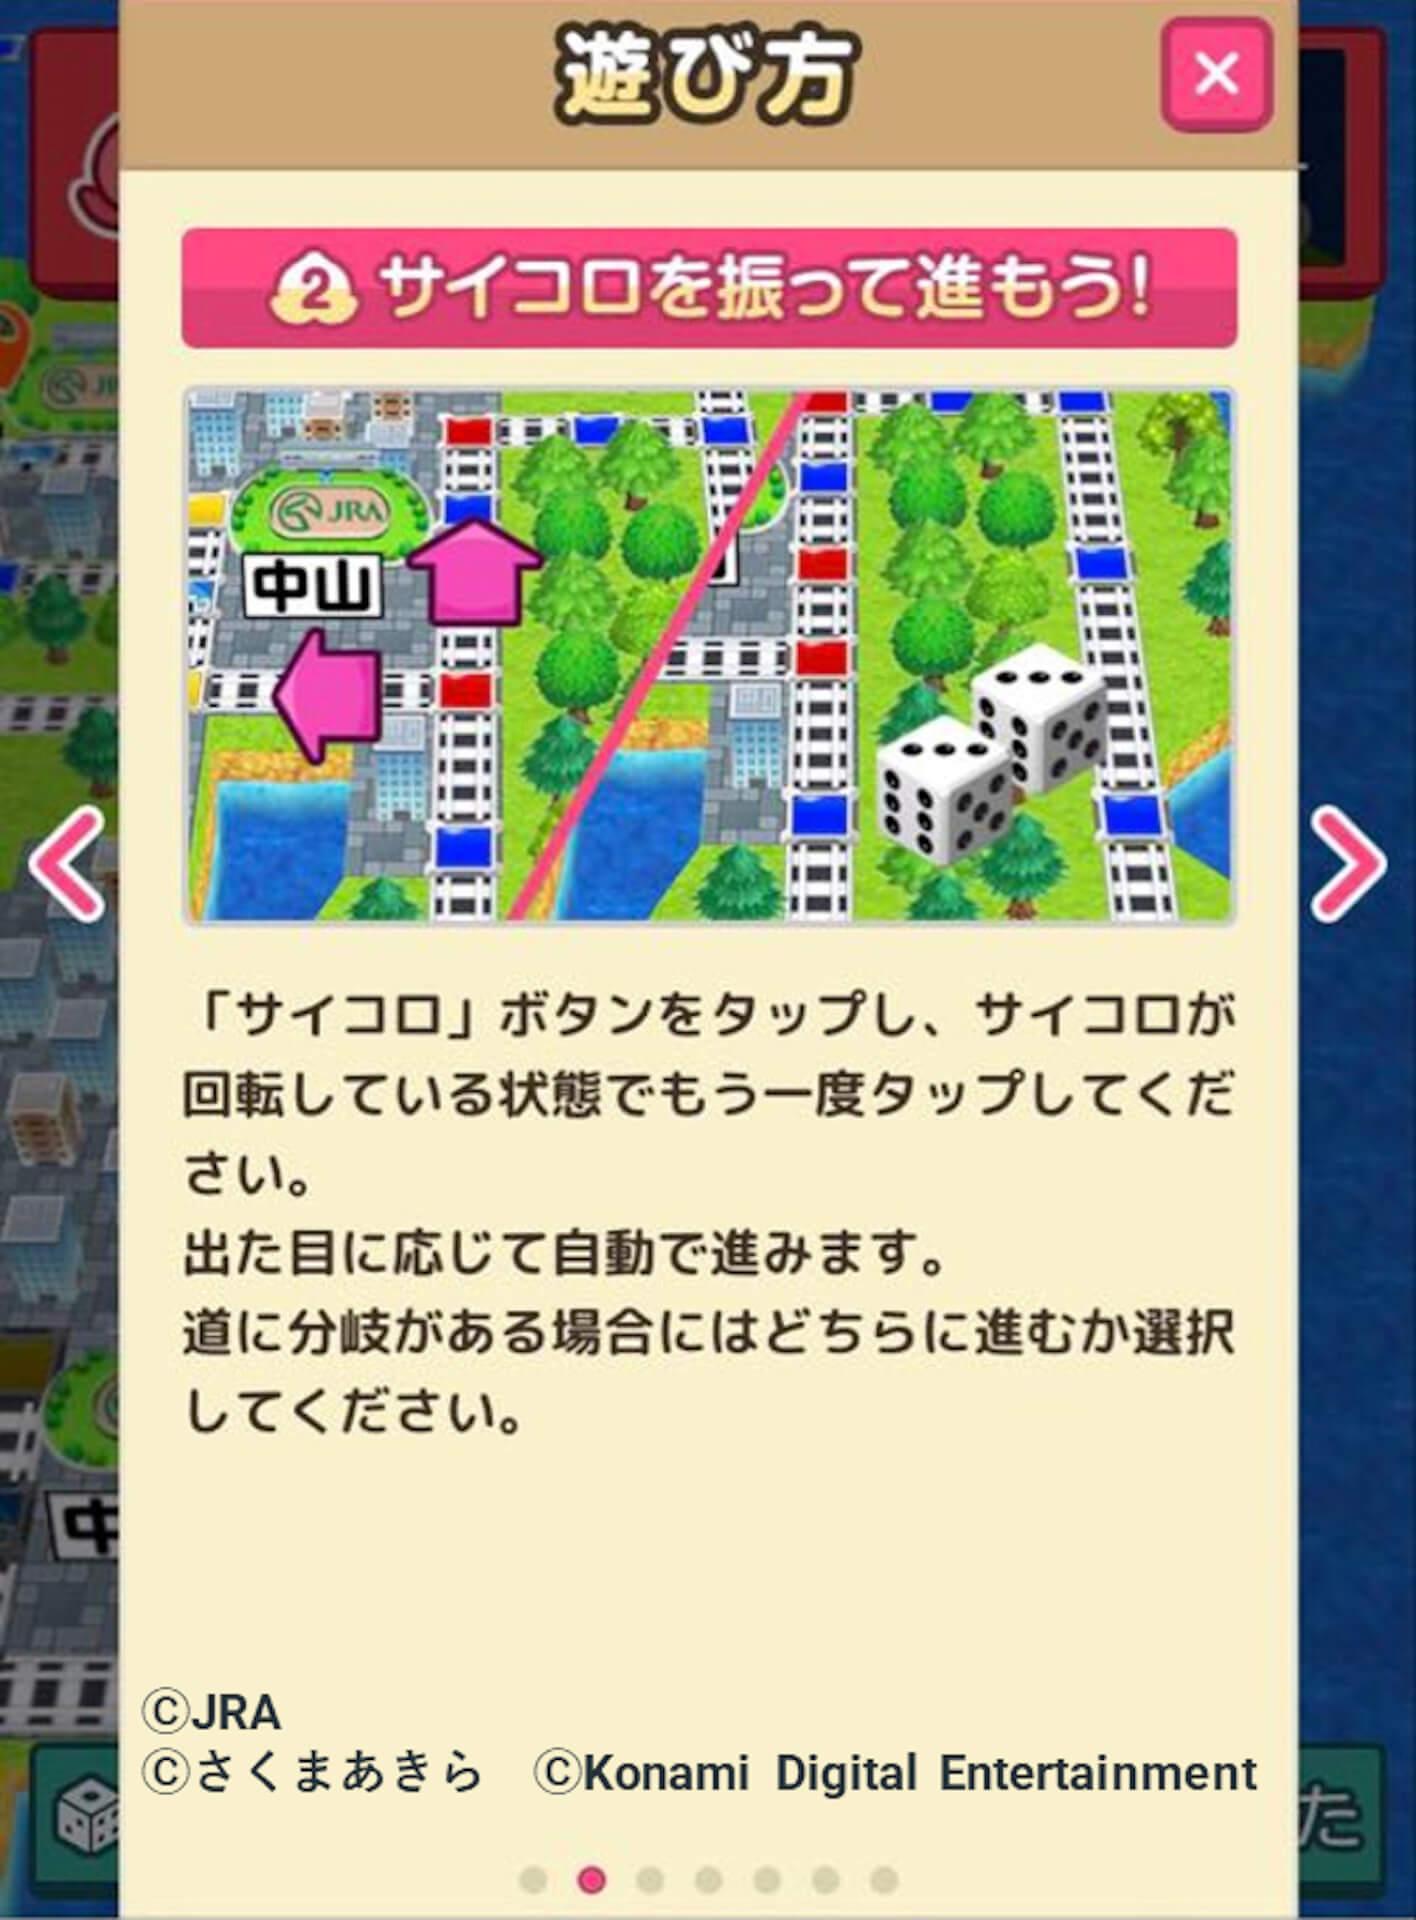 JRAと桃太郎電鉄が日本ダービーでコラボ!1万円分の電子マネーギフトが当たるTwitterキャンペーンも実施 tech210517_jra-momotetsu-210517_3